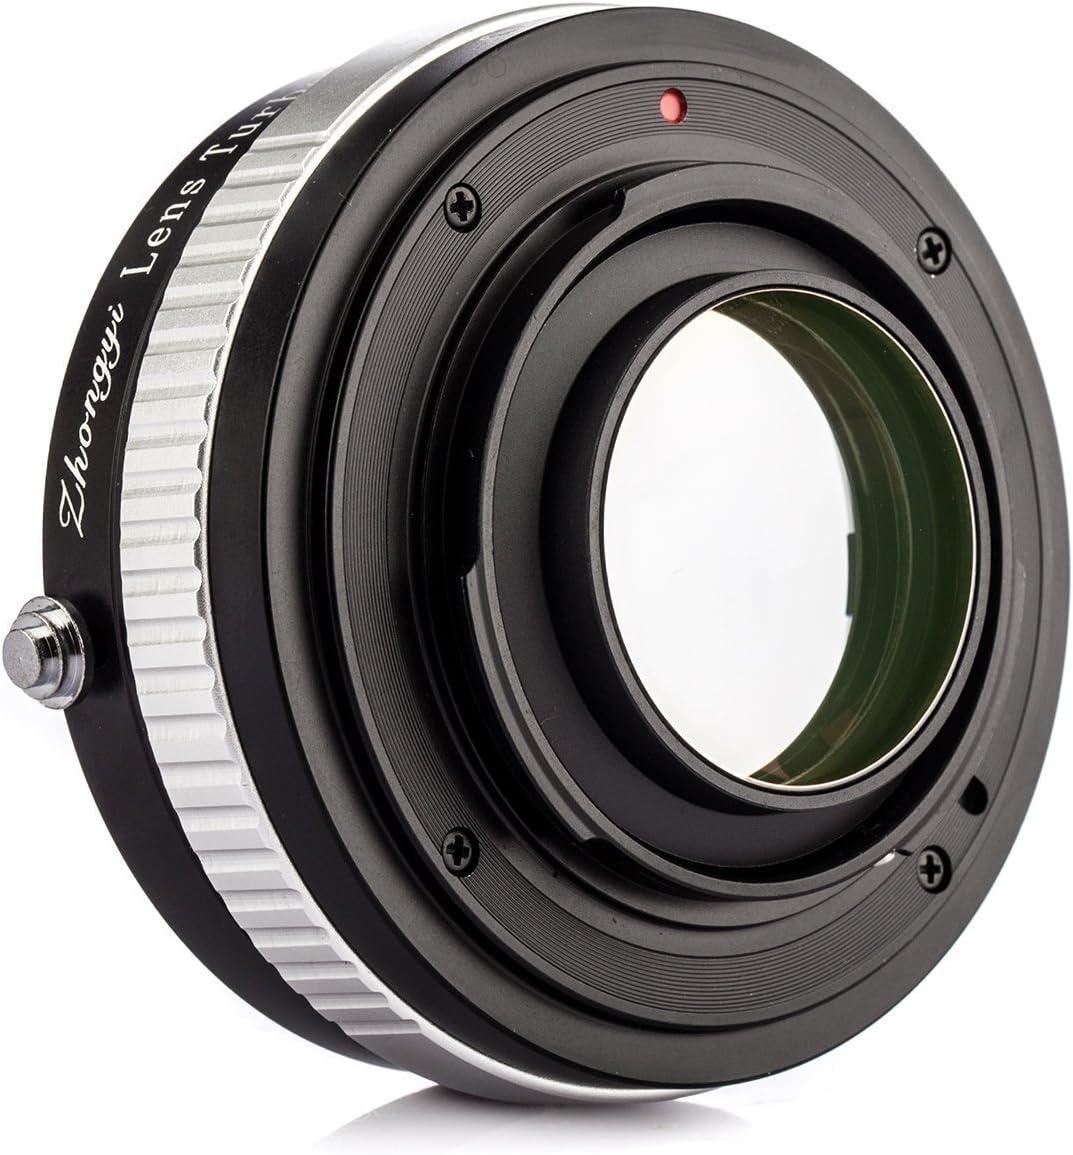 ZhongYi Mitakon Pro Lens Turbo Adapter Version II Nikon nikkor for Fujifilm X Mount Cameras